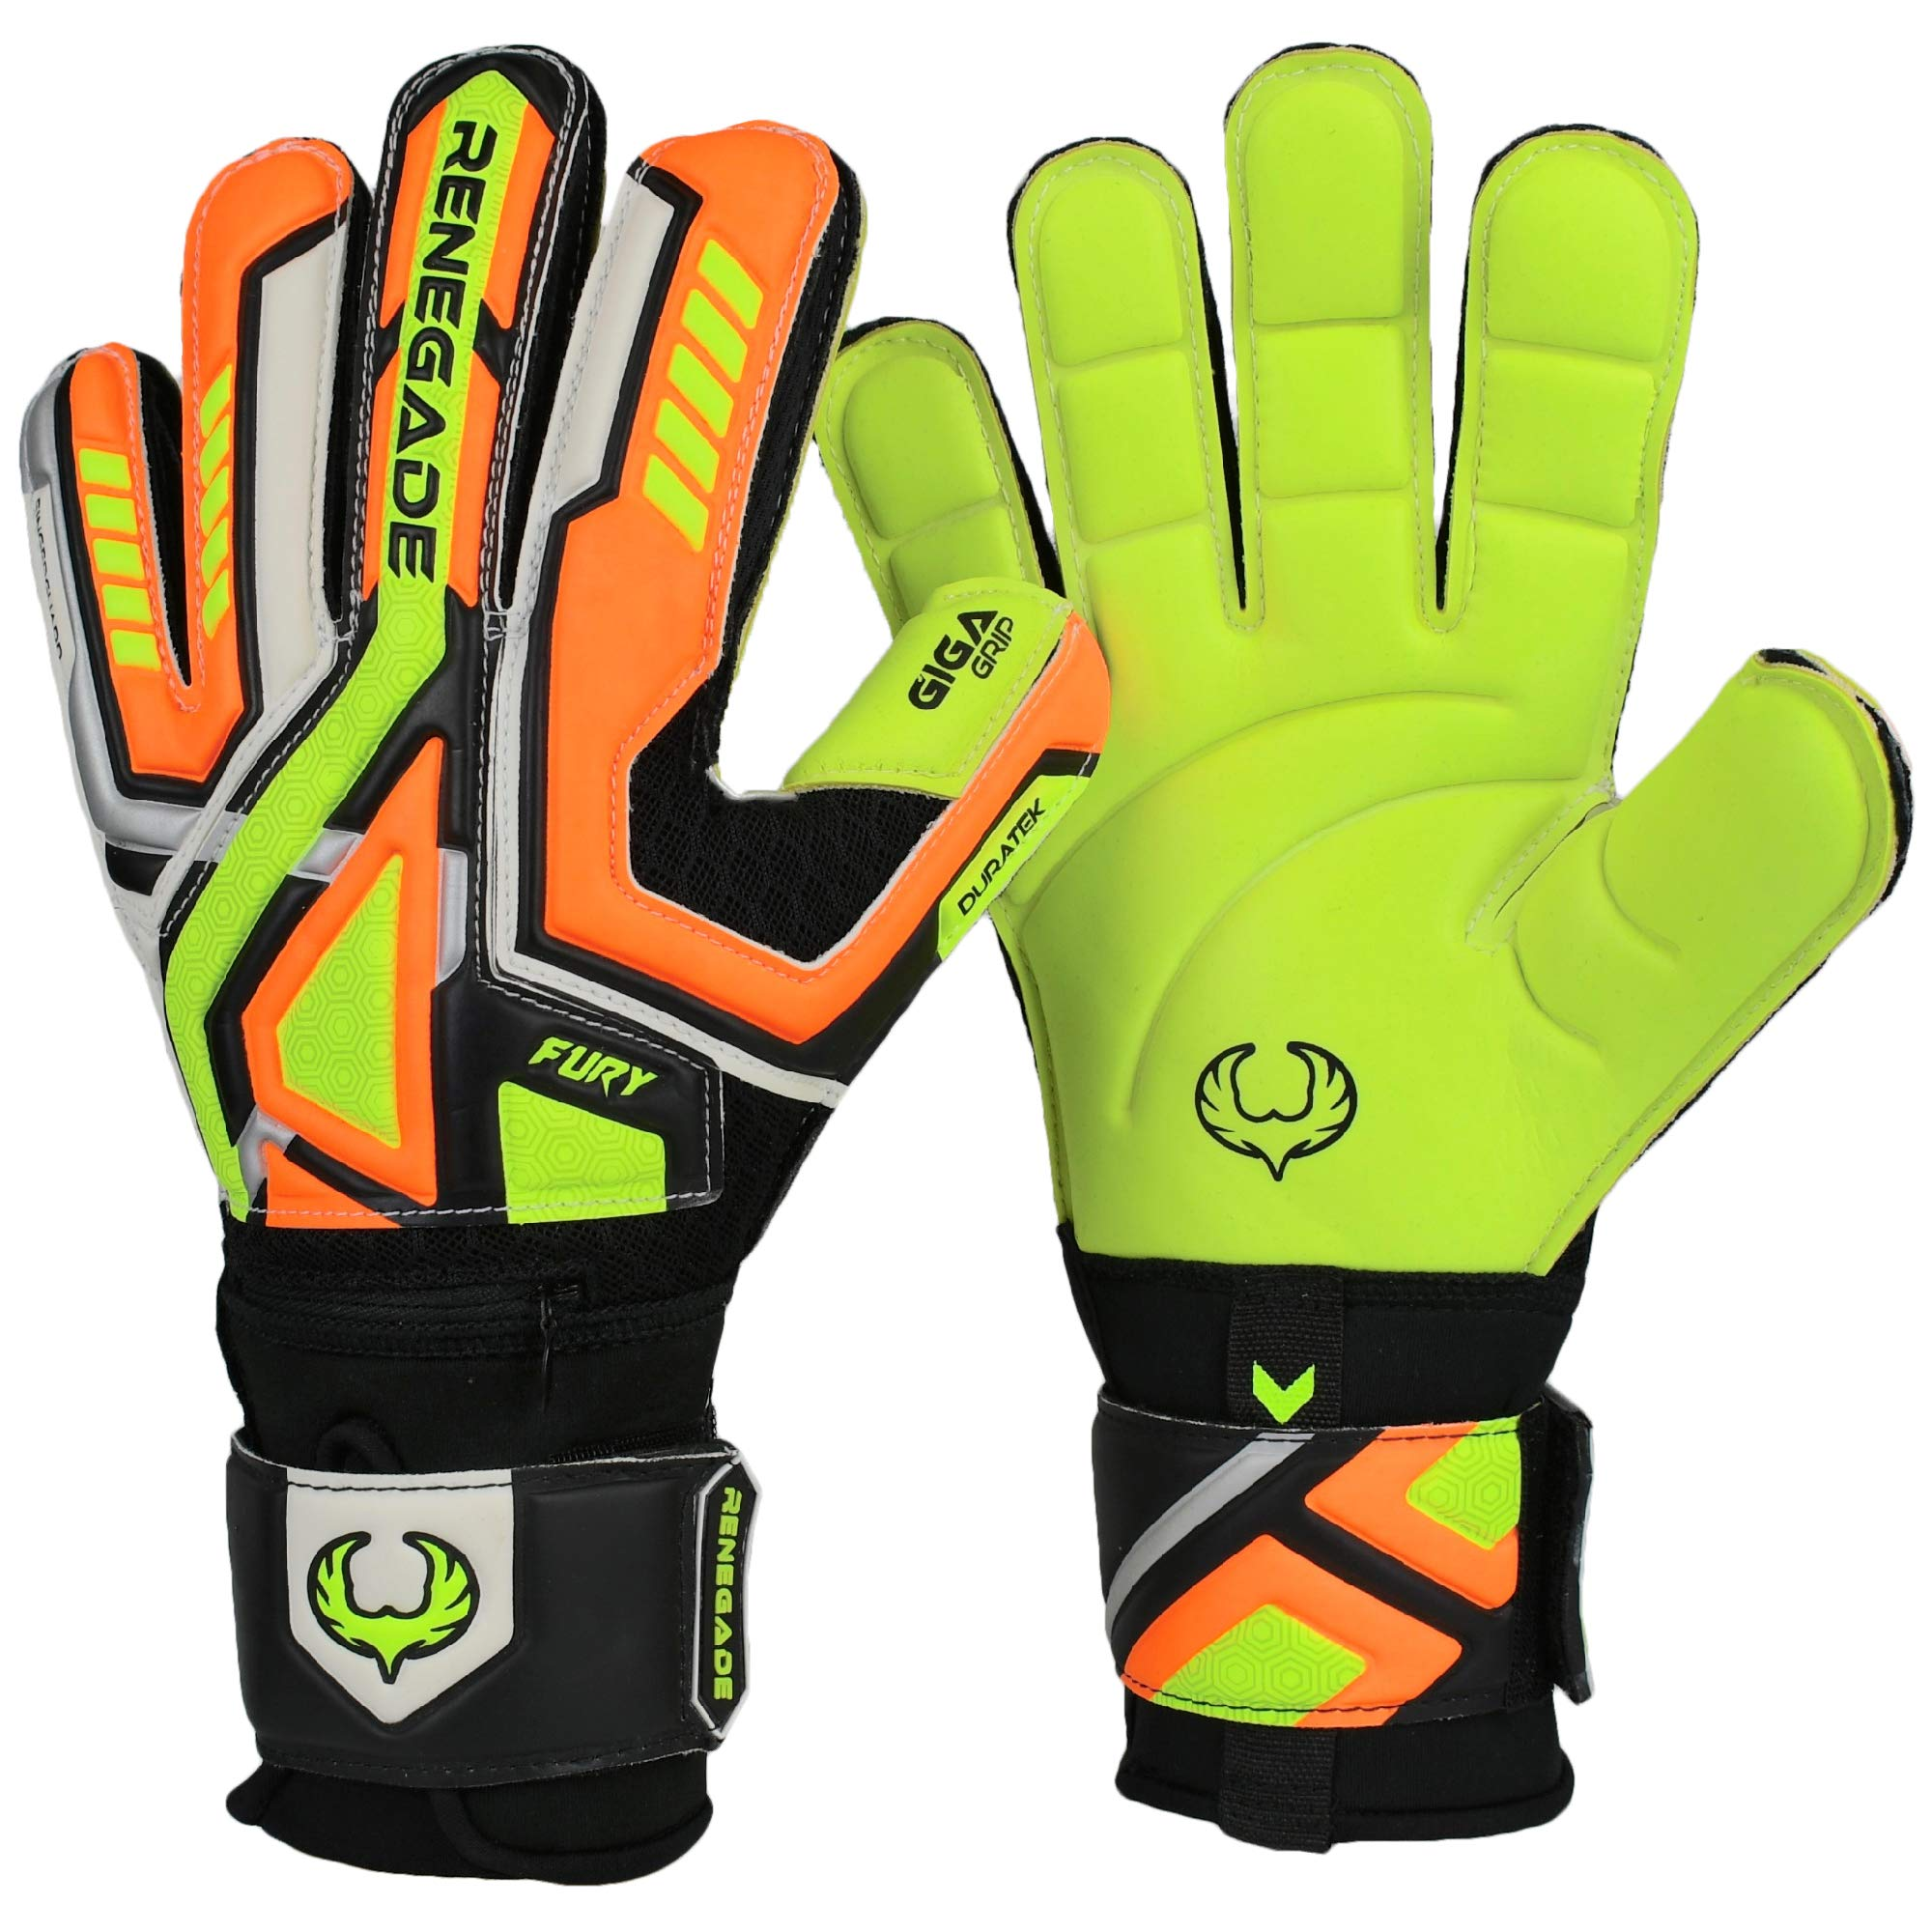 Renegade GK Fury Volt Flat Gecko Cut Level 4 Womens & Mens Soccer Goalie Glove for Kids & Adults with Fingersaves - GK Gloves - Boys Goalie Gloves - Size 7 Goalie Gloves Junior & Adult